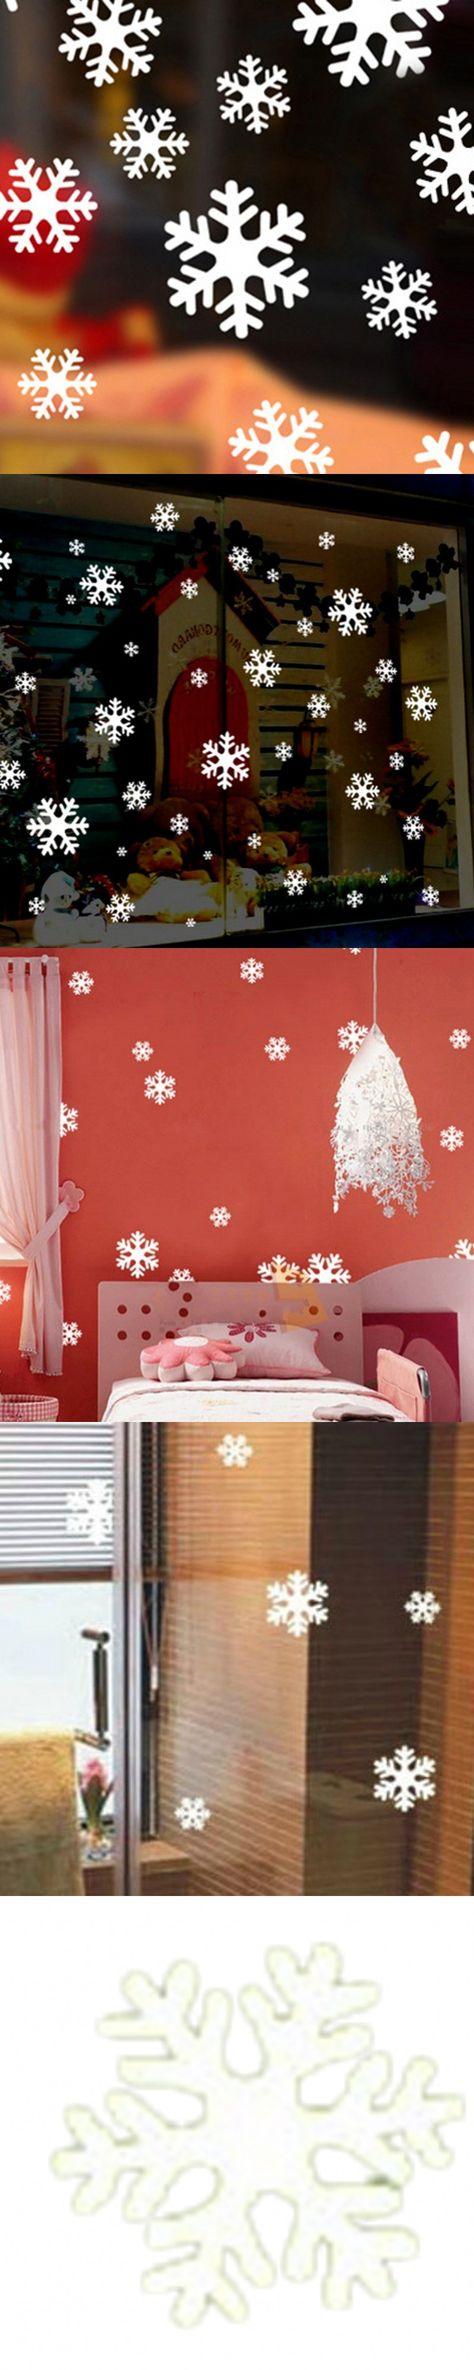 2016 Hot Beautiful White Christmas Snowflake Sheet Ornament Window Glass Sticker Home Decoration $3.86